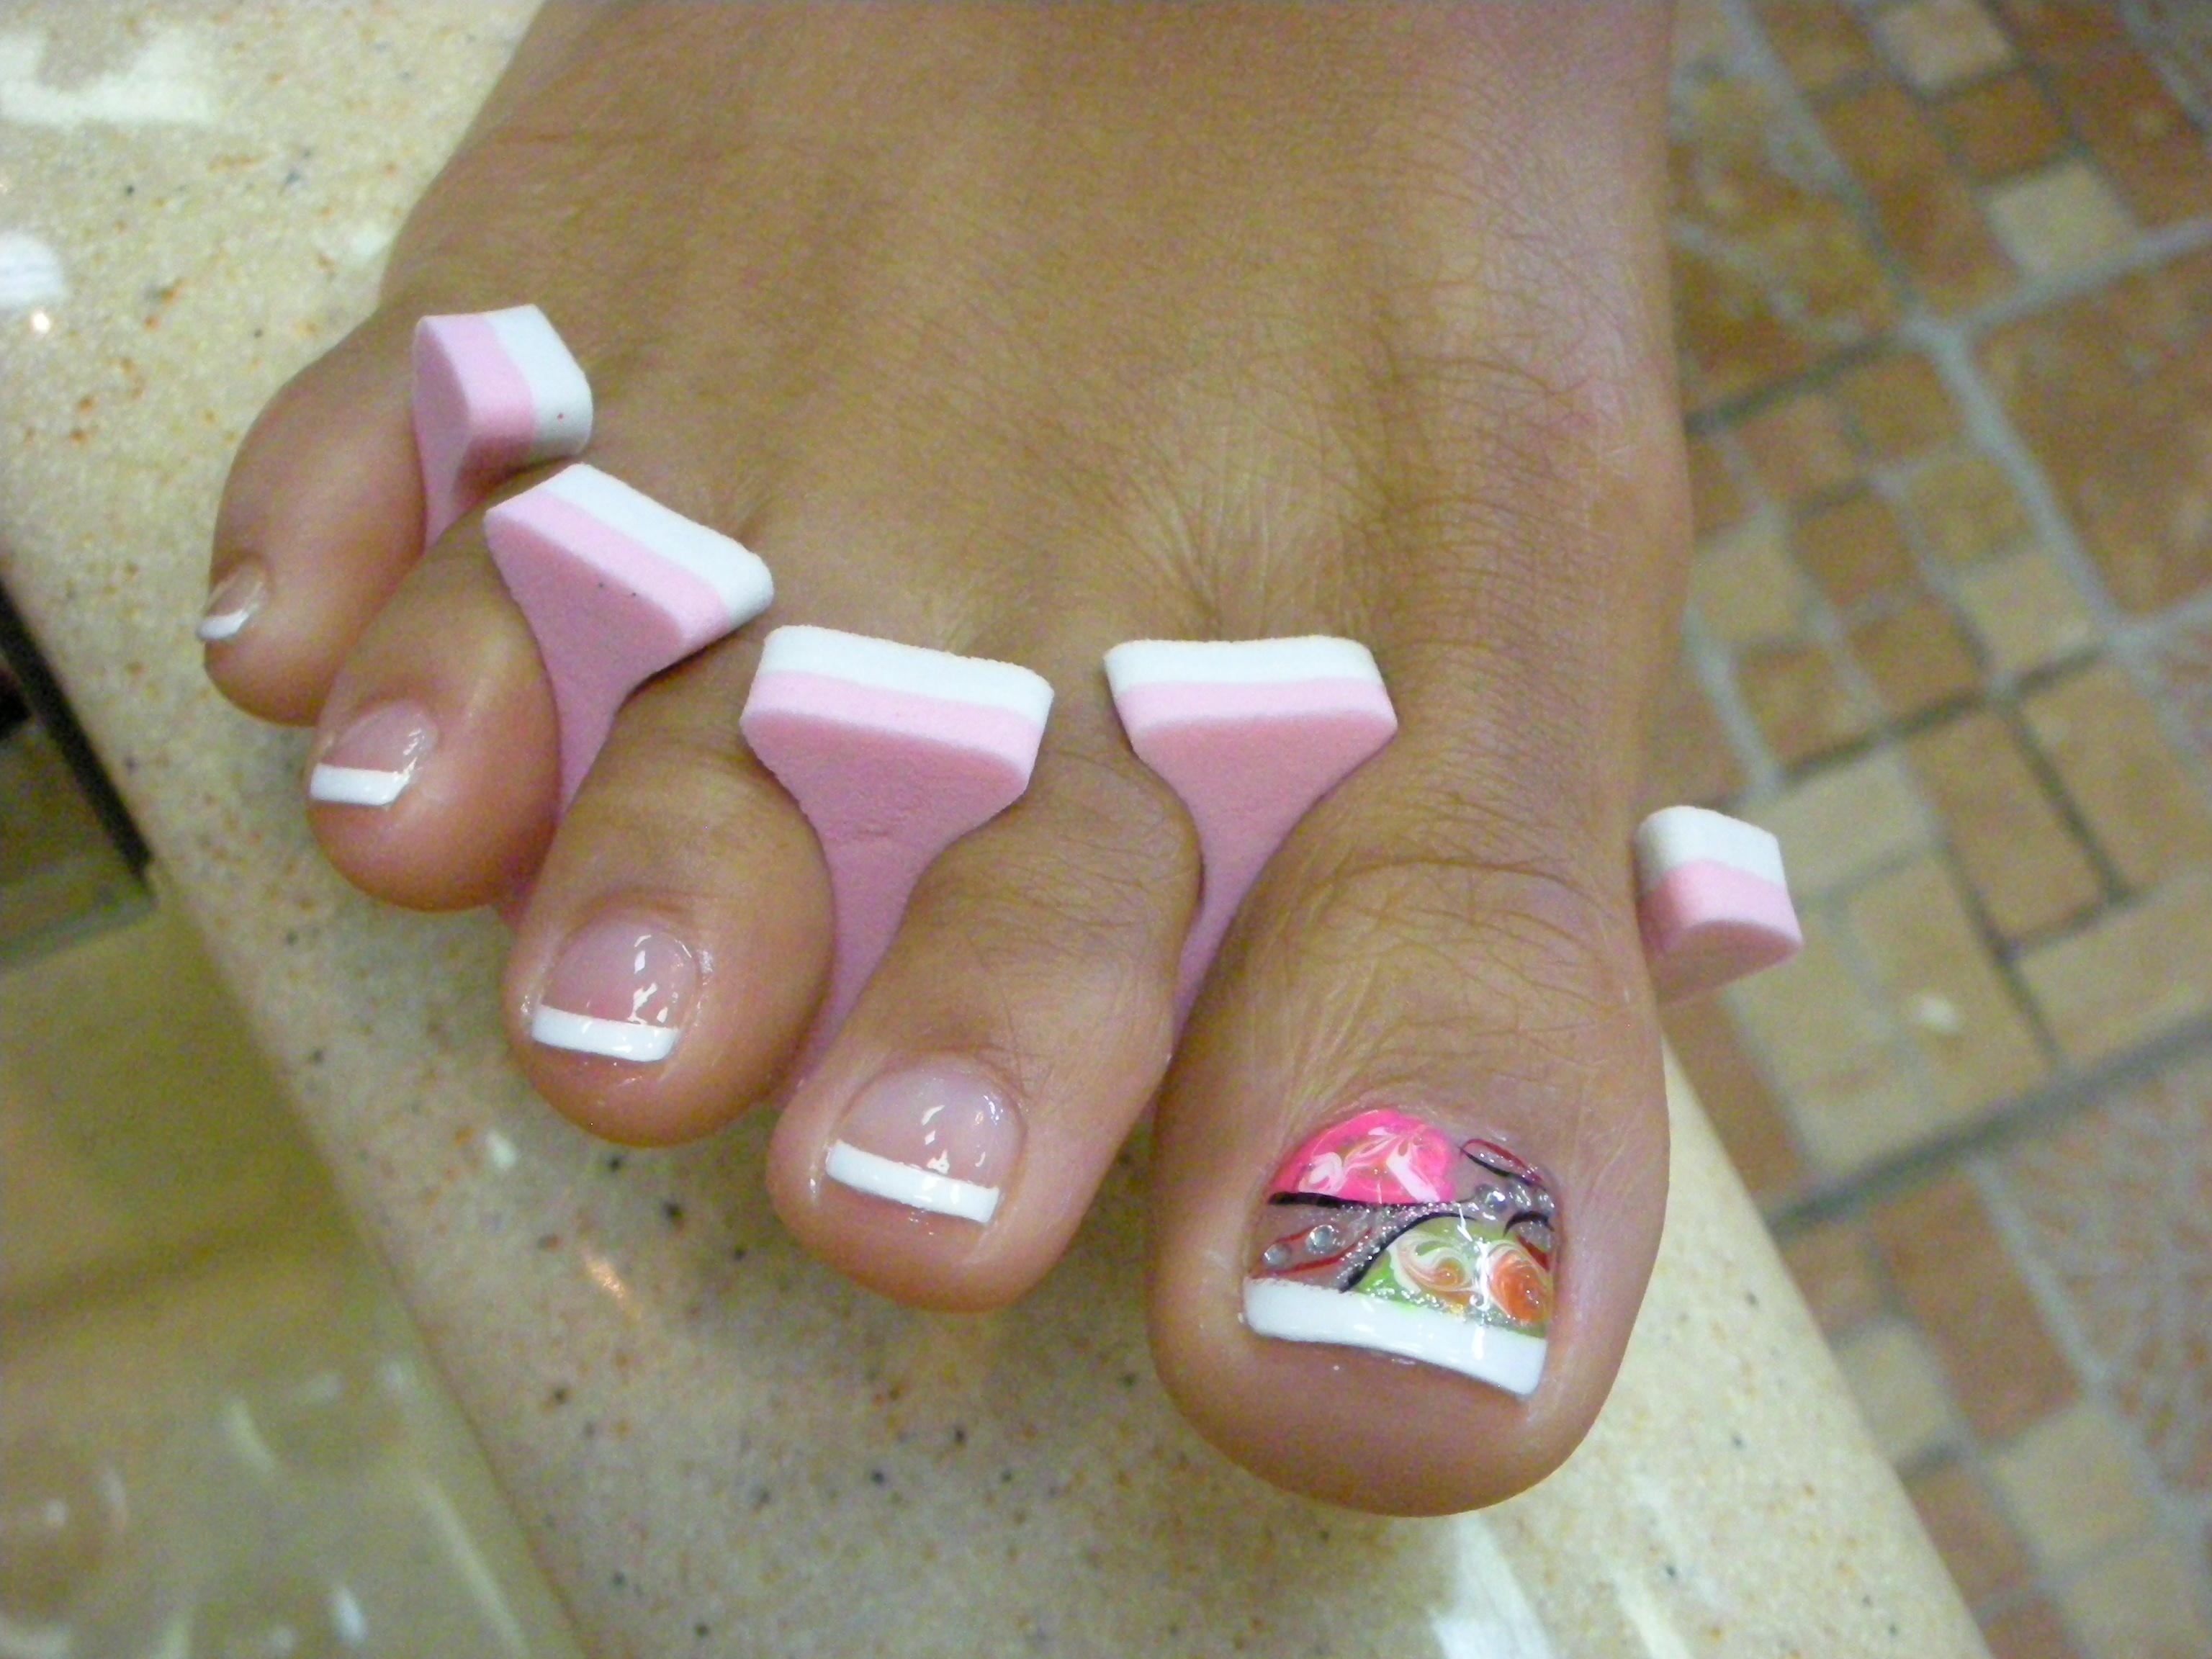 Toe Nail Design With Rhinestone